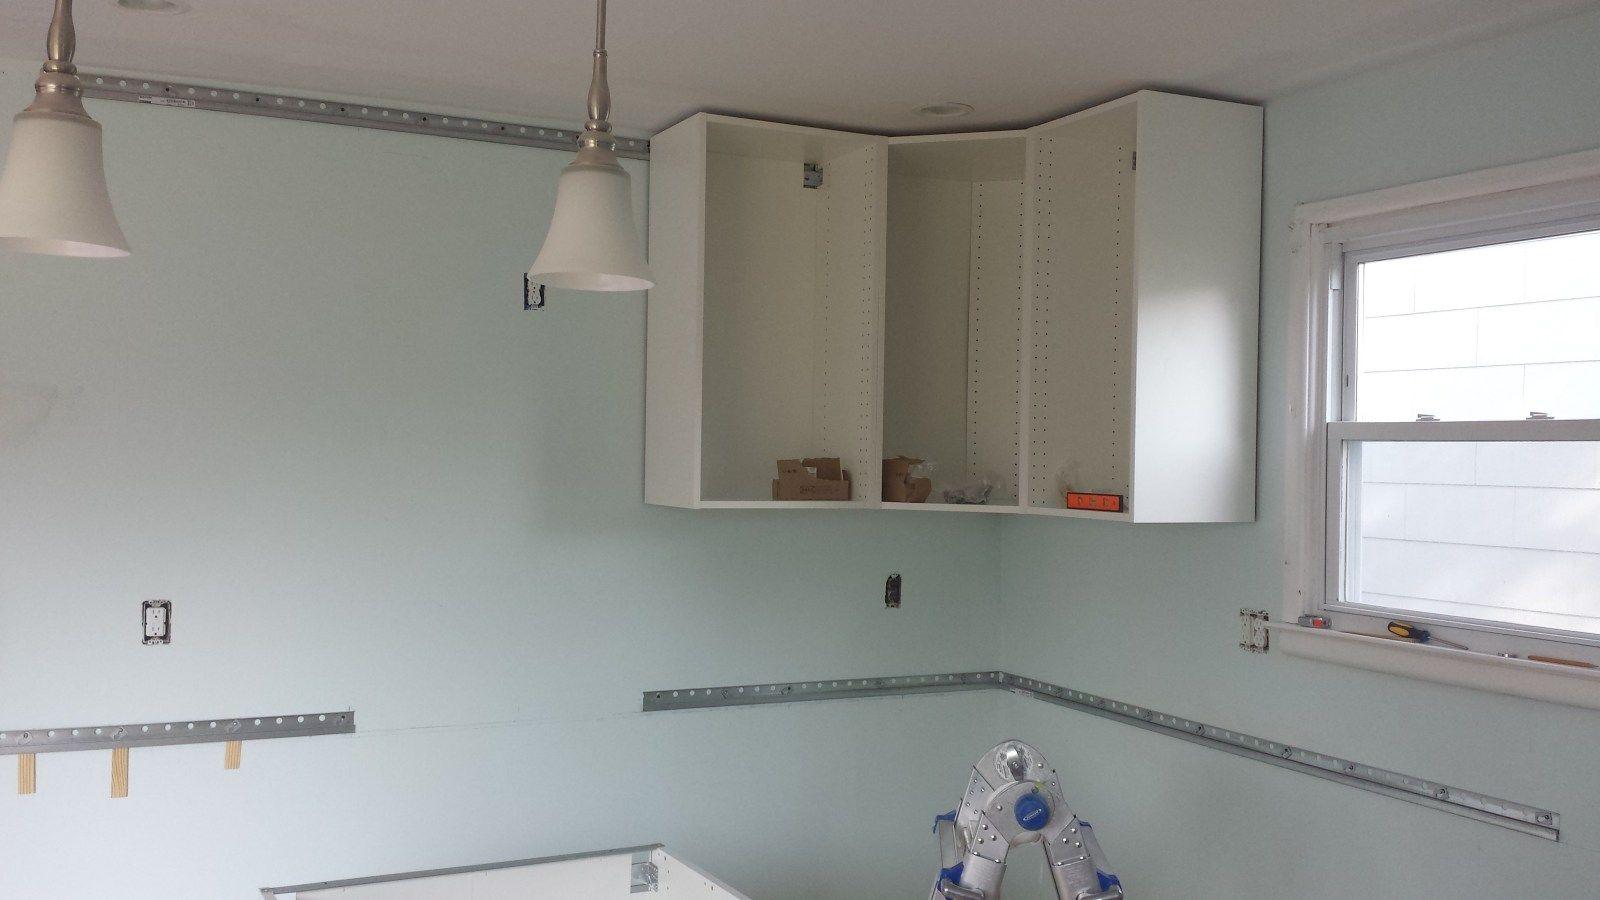 Installing IKEA Kitchen Cabinets The DIY Way | Offbeat Home U0026 Life